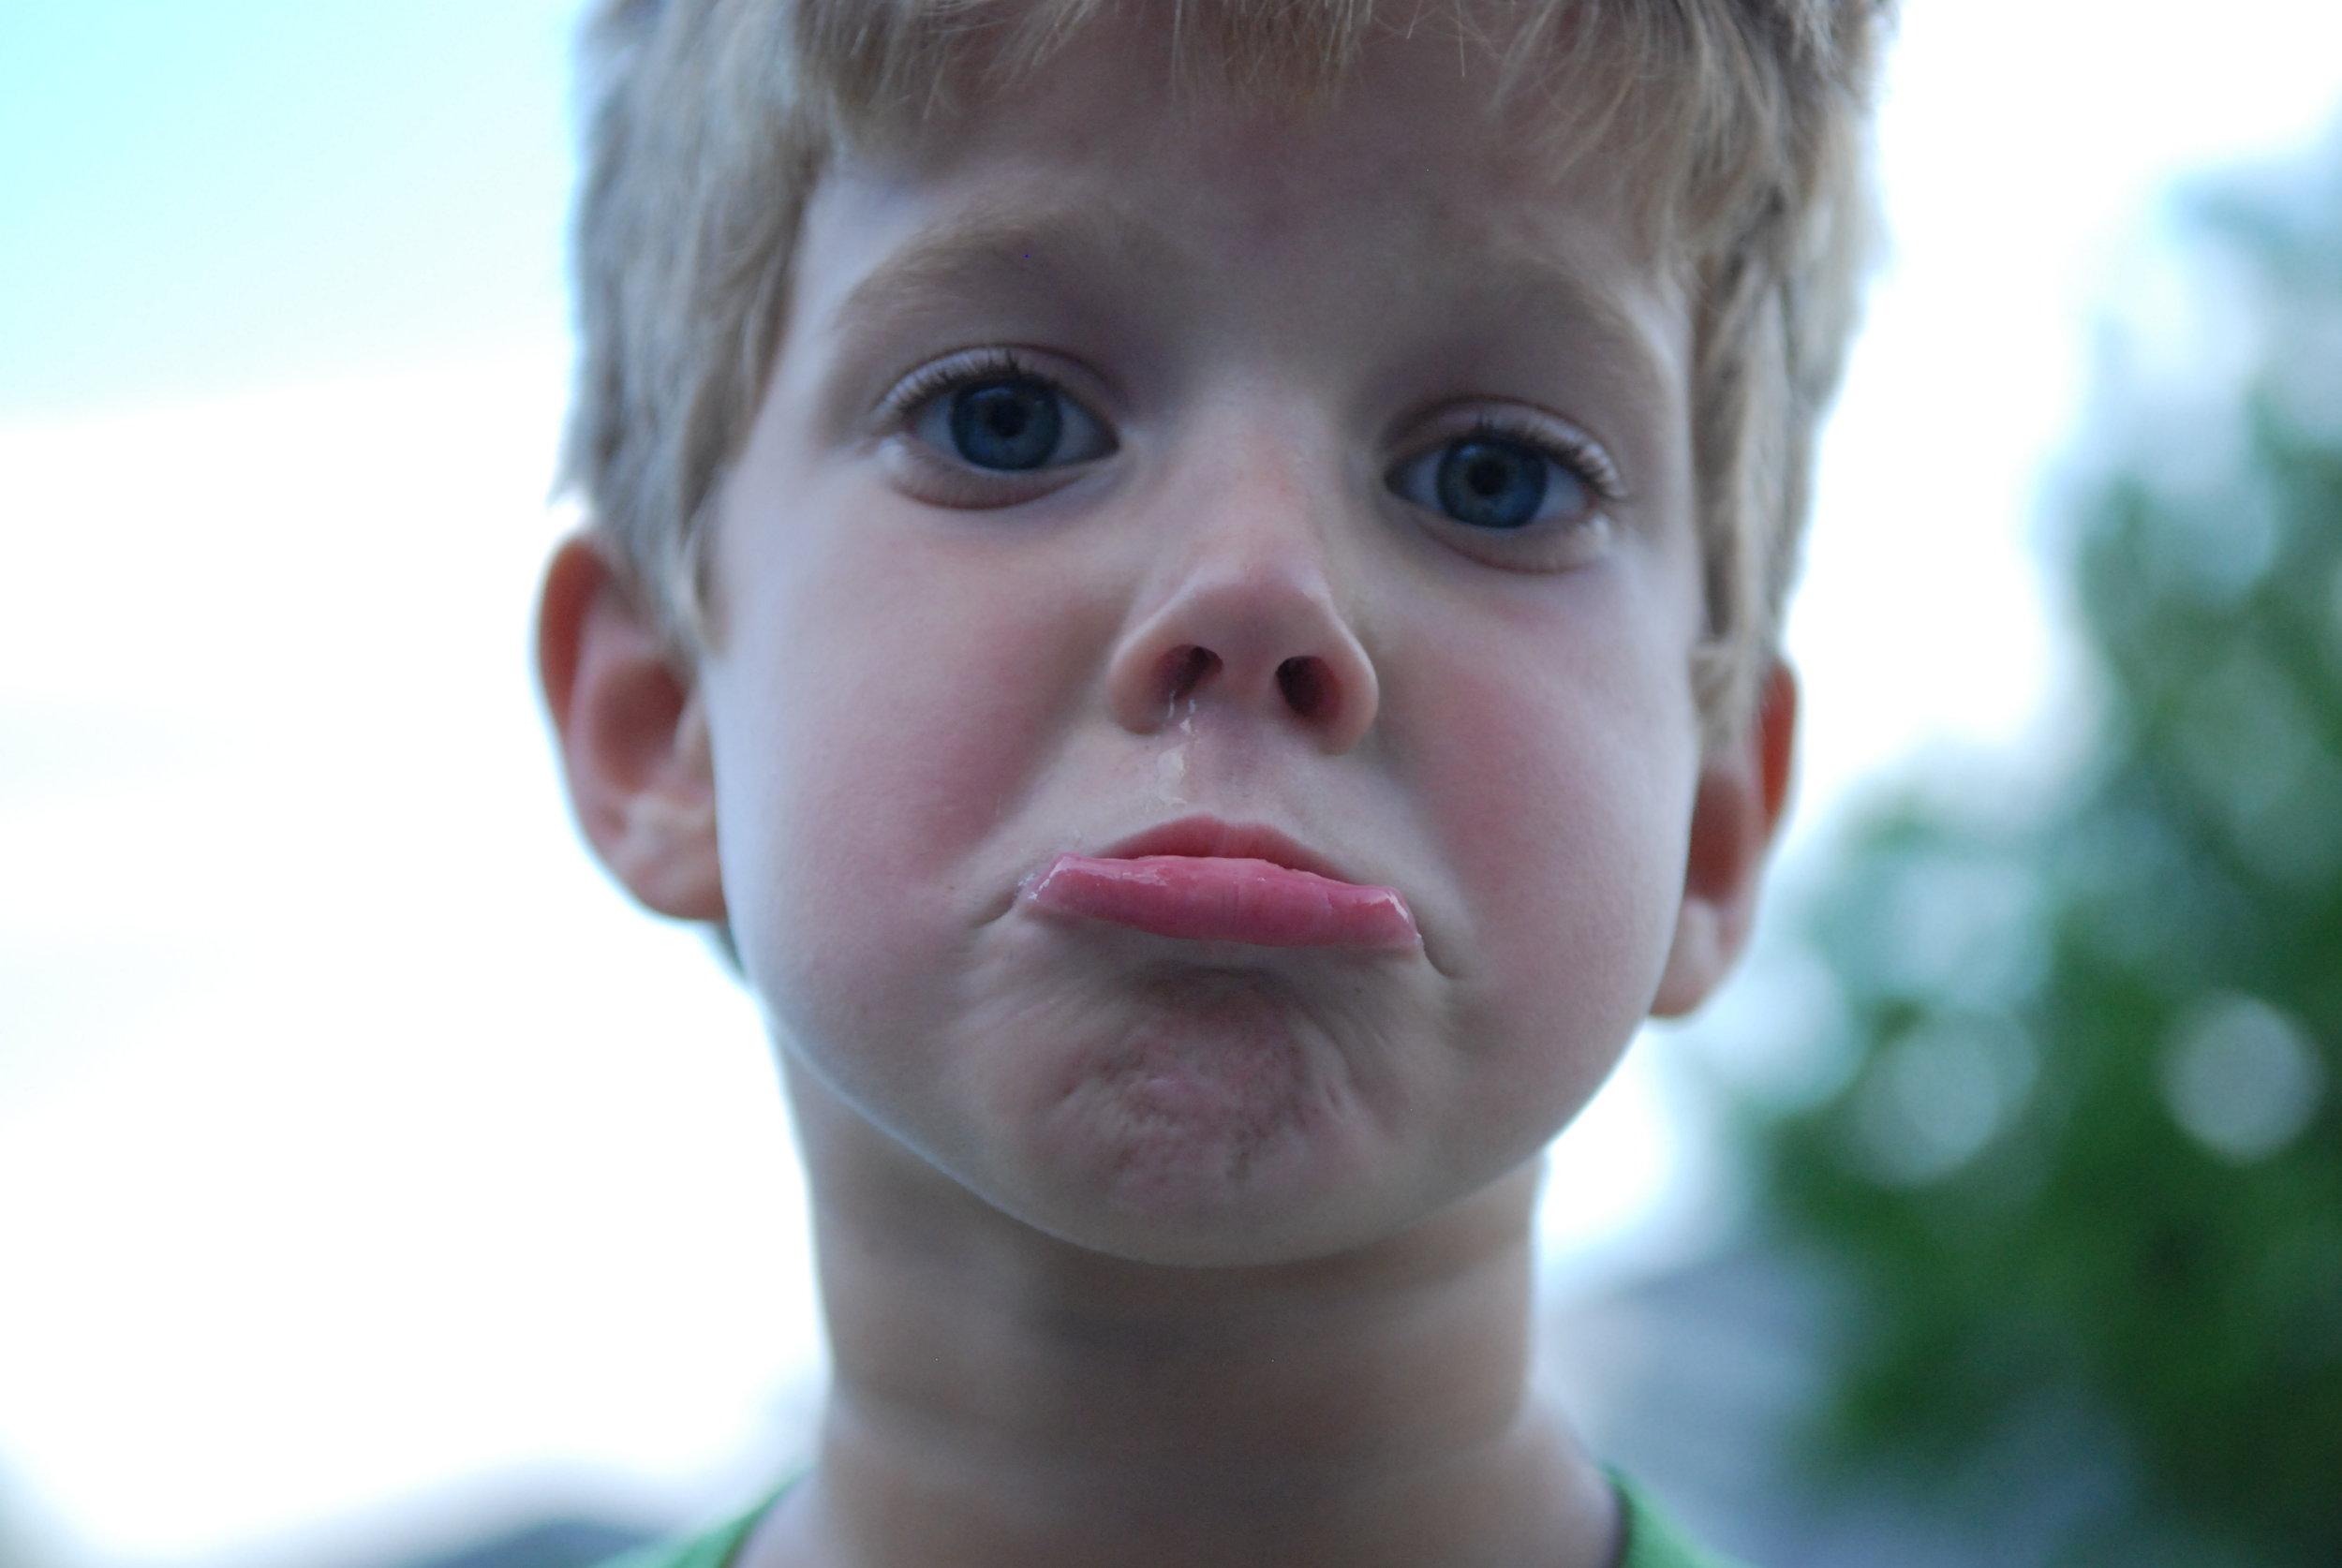 pouting child image